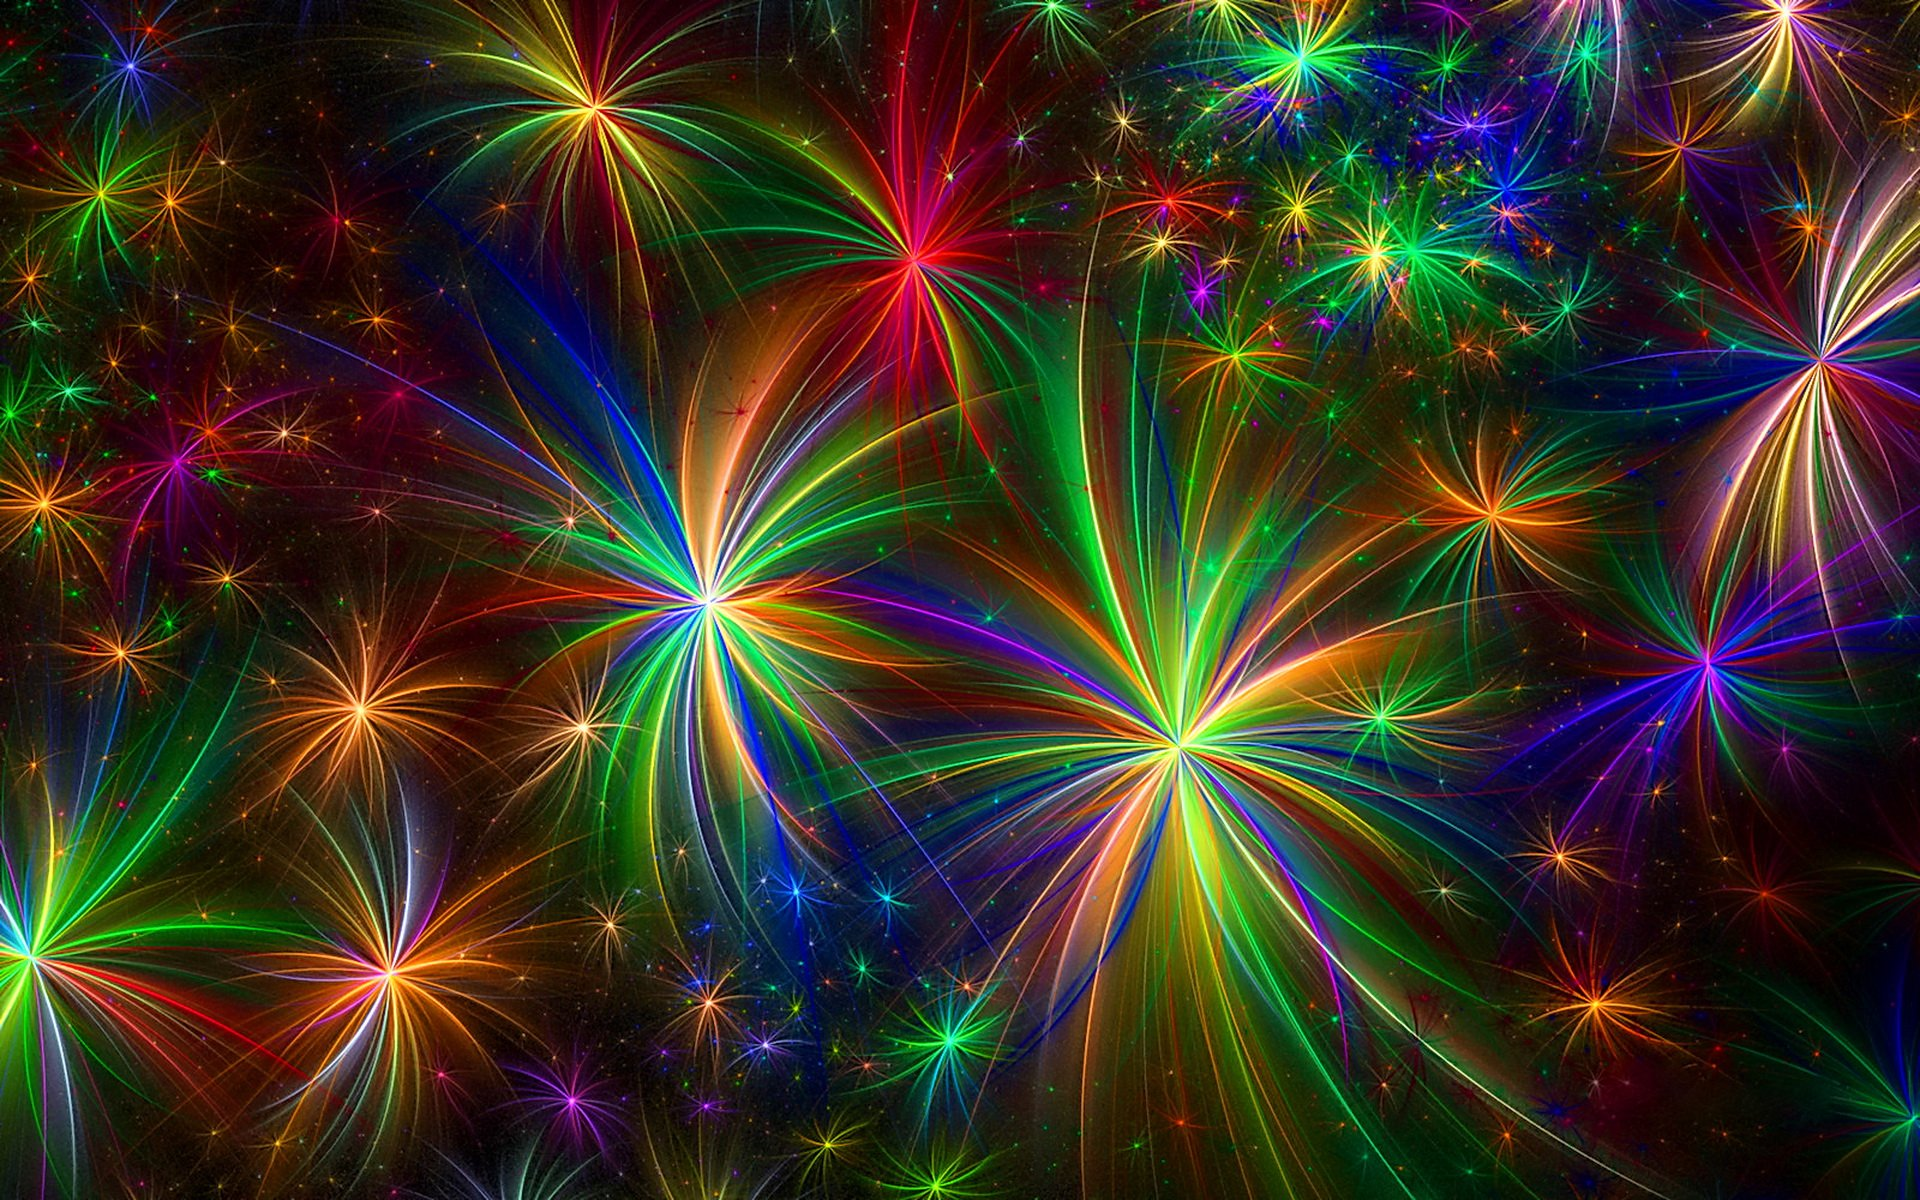 Fireworks Wallpaper Free: Fireworks Background Wallpaper